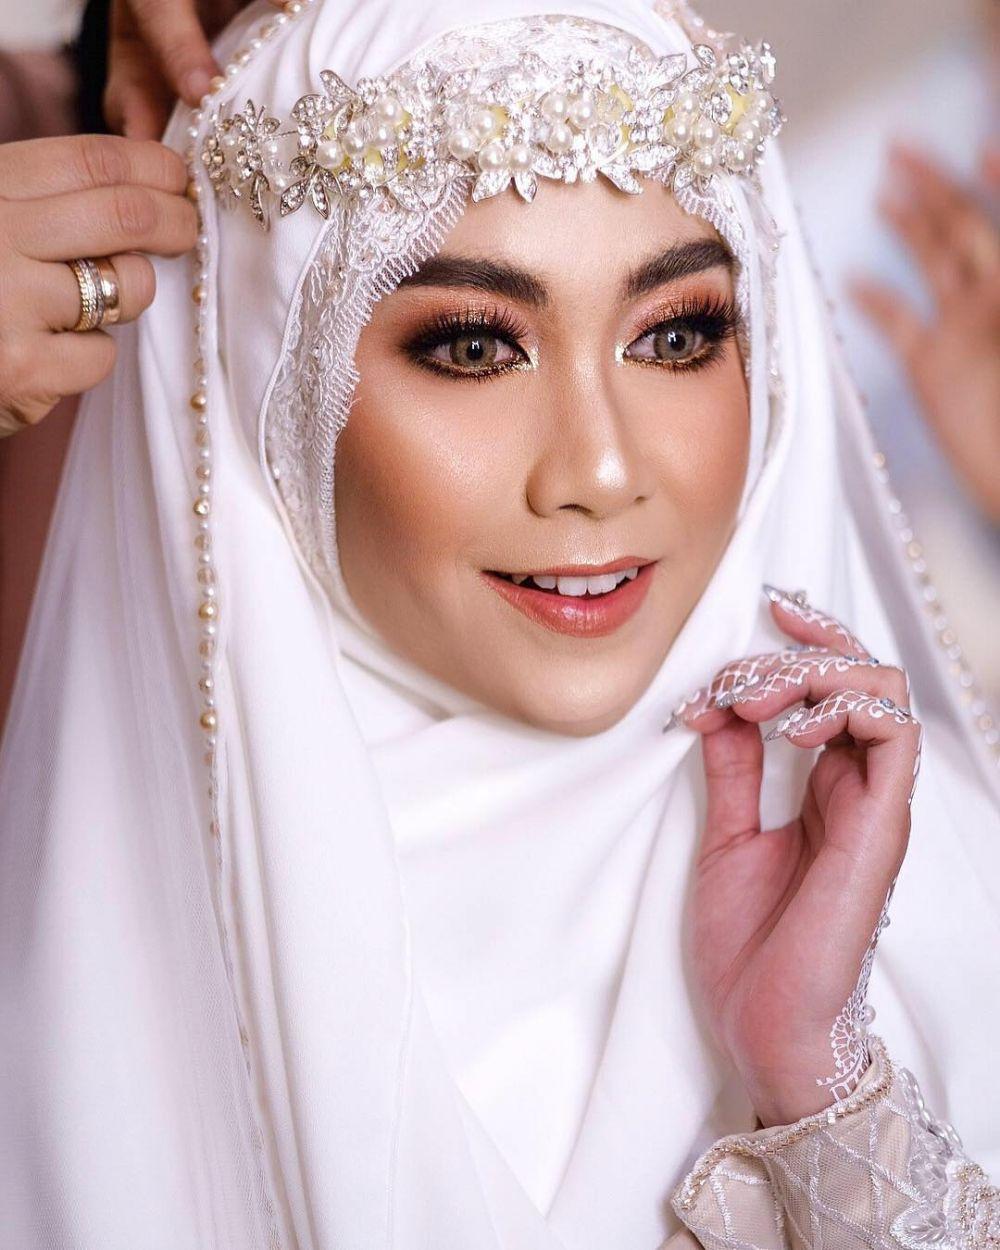 8 Inspirasi gaun pengantin seleb berhijab, tradisional sampai mod